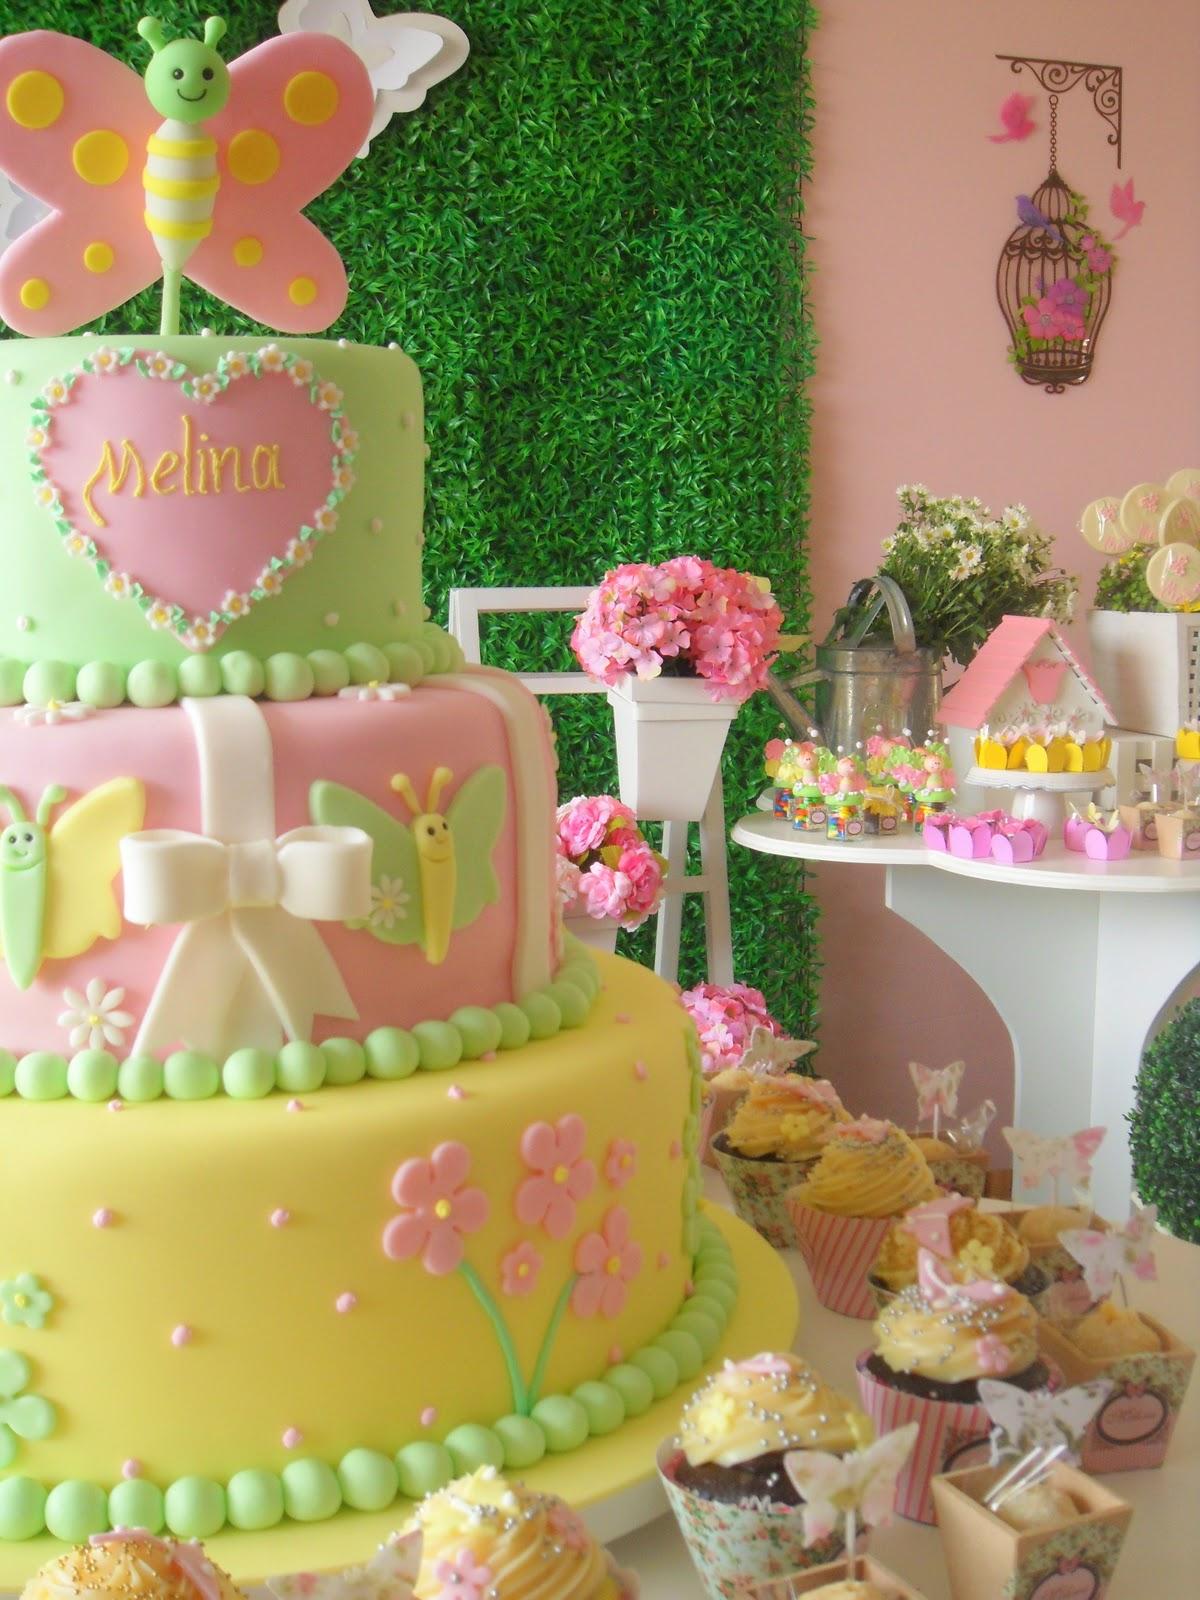 Chocolate cake pig fest - 1 9